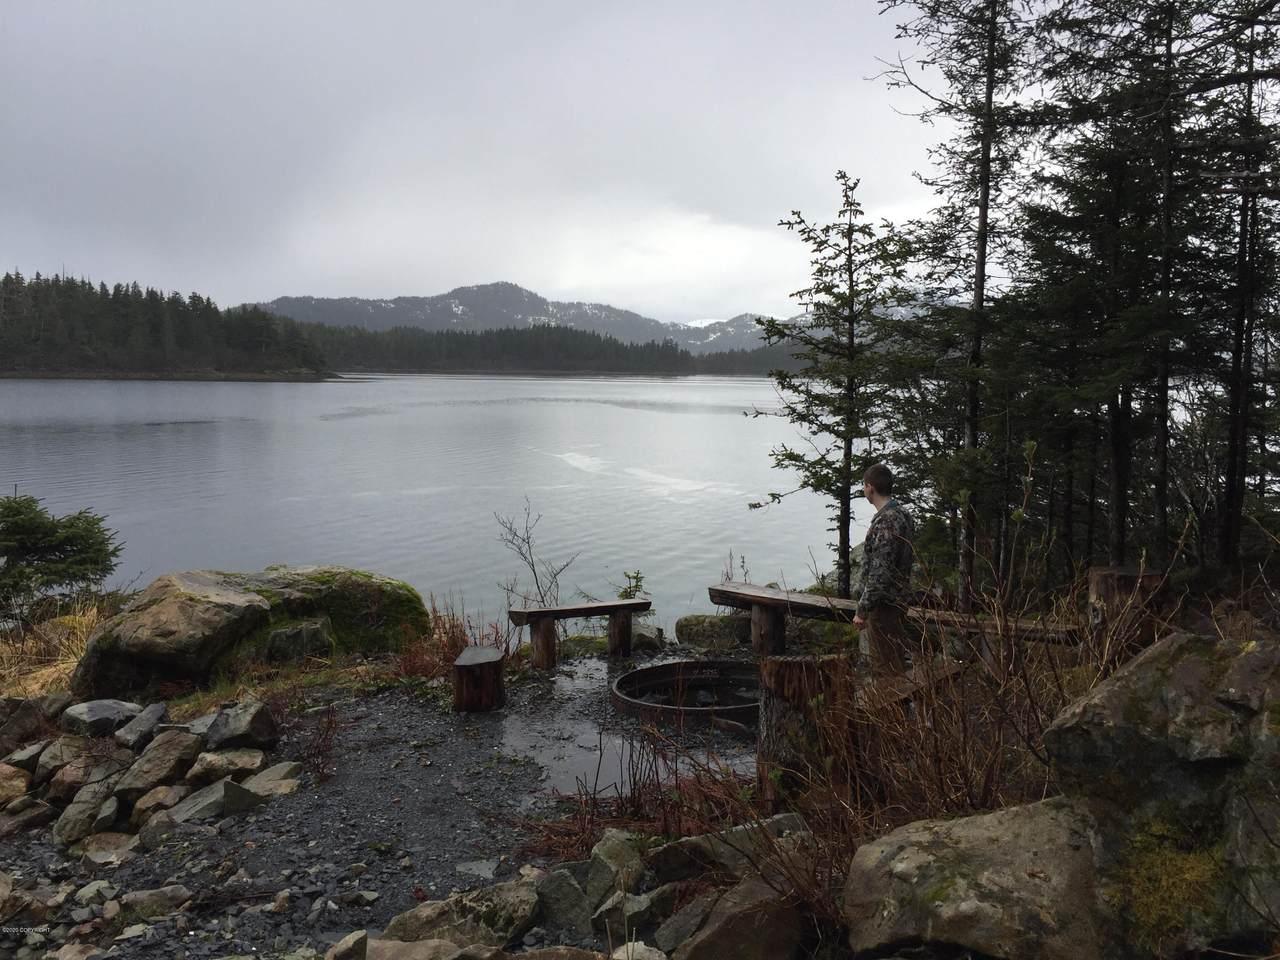 https://bt-photos.global.ssl.fastly.net/alaska/1280_boomver_1_20-7848-2.jpg